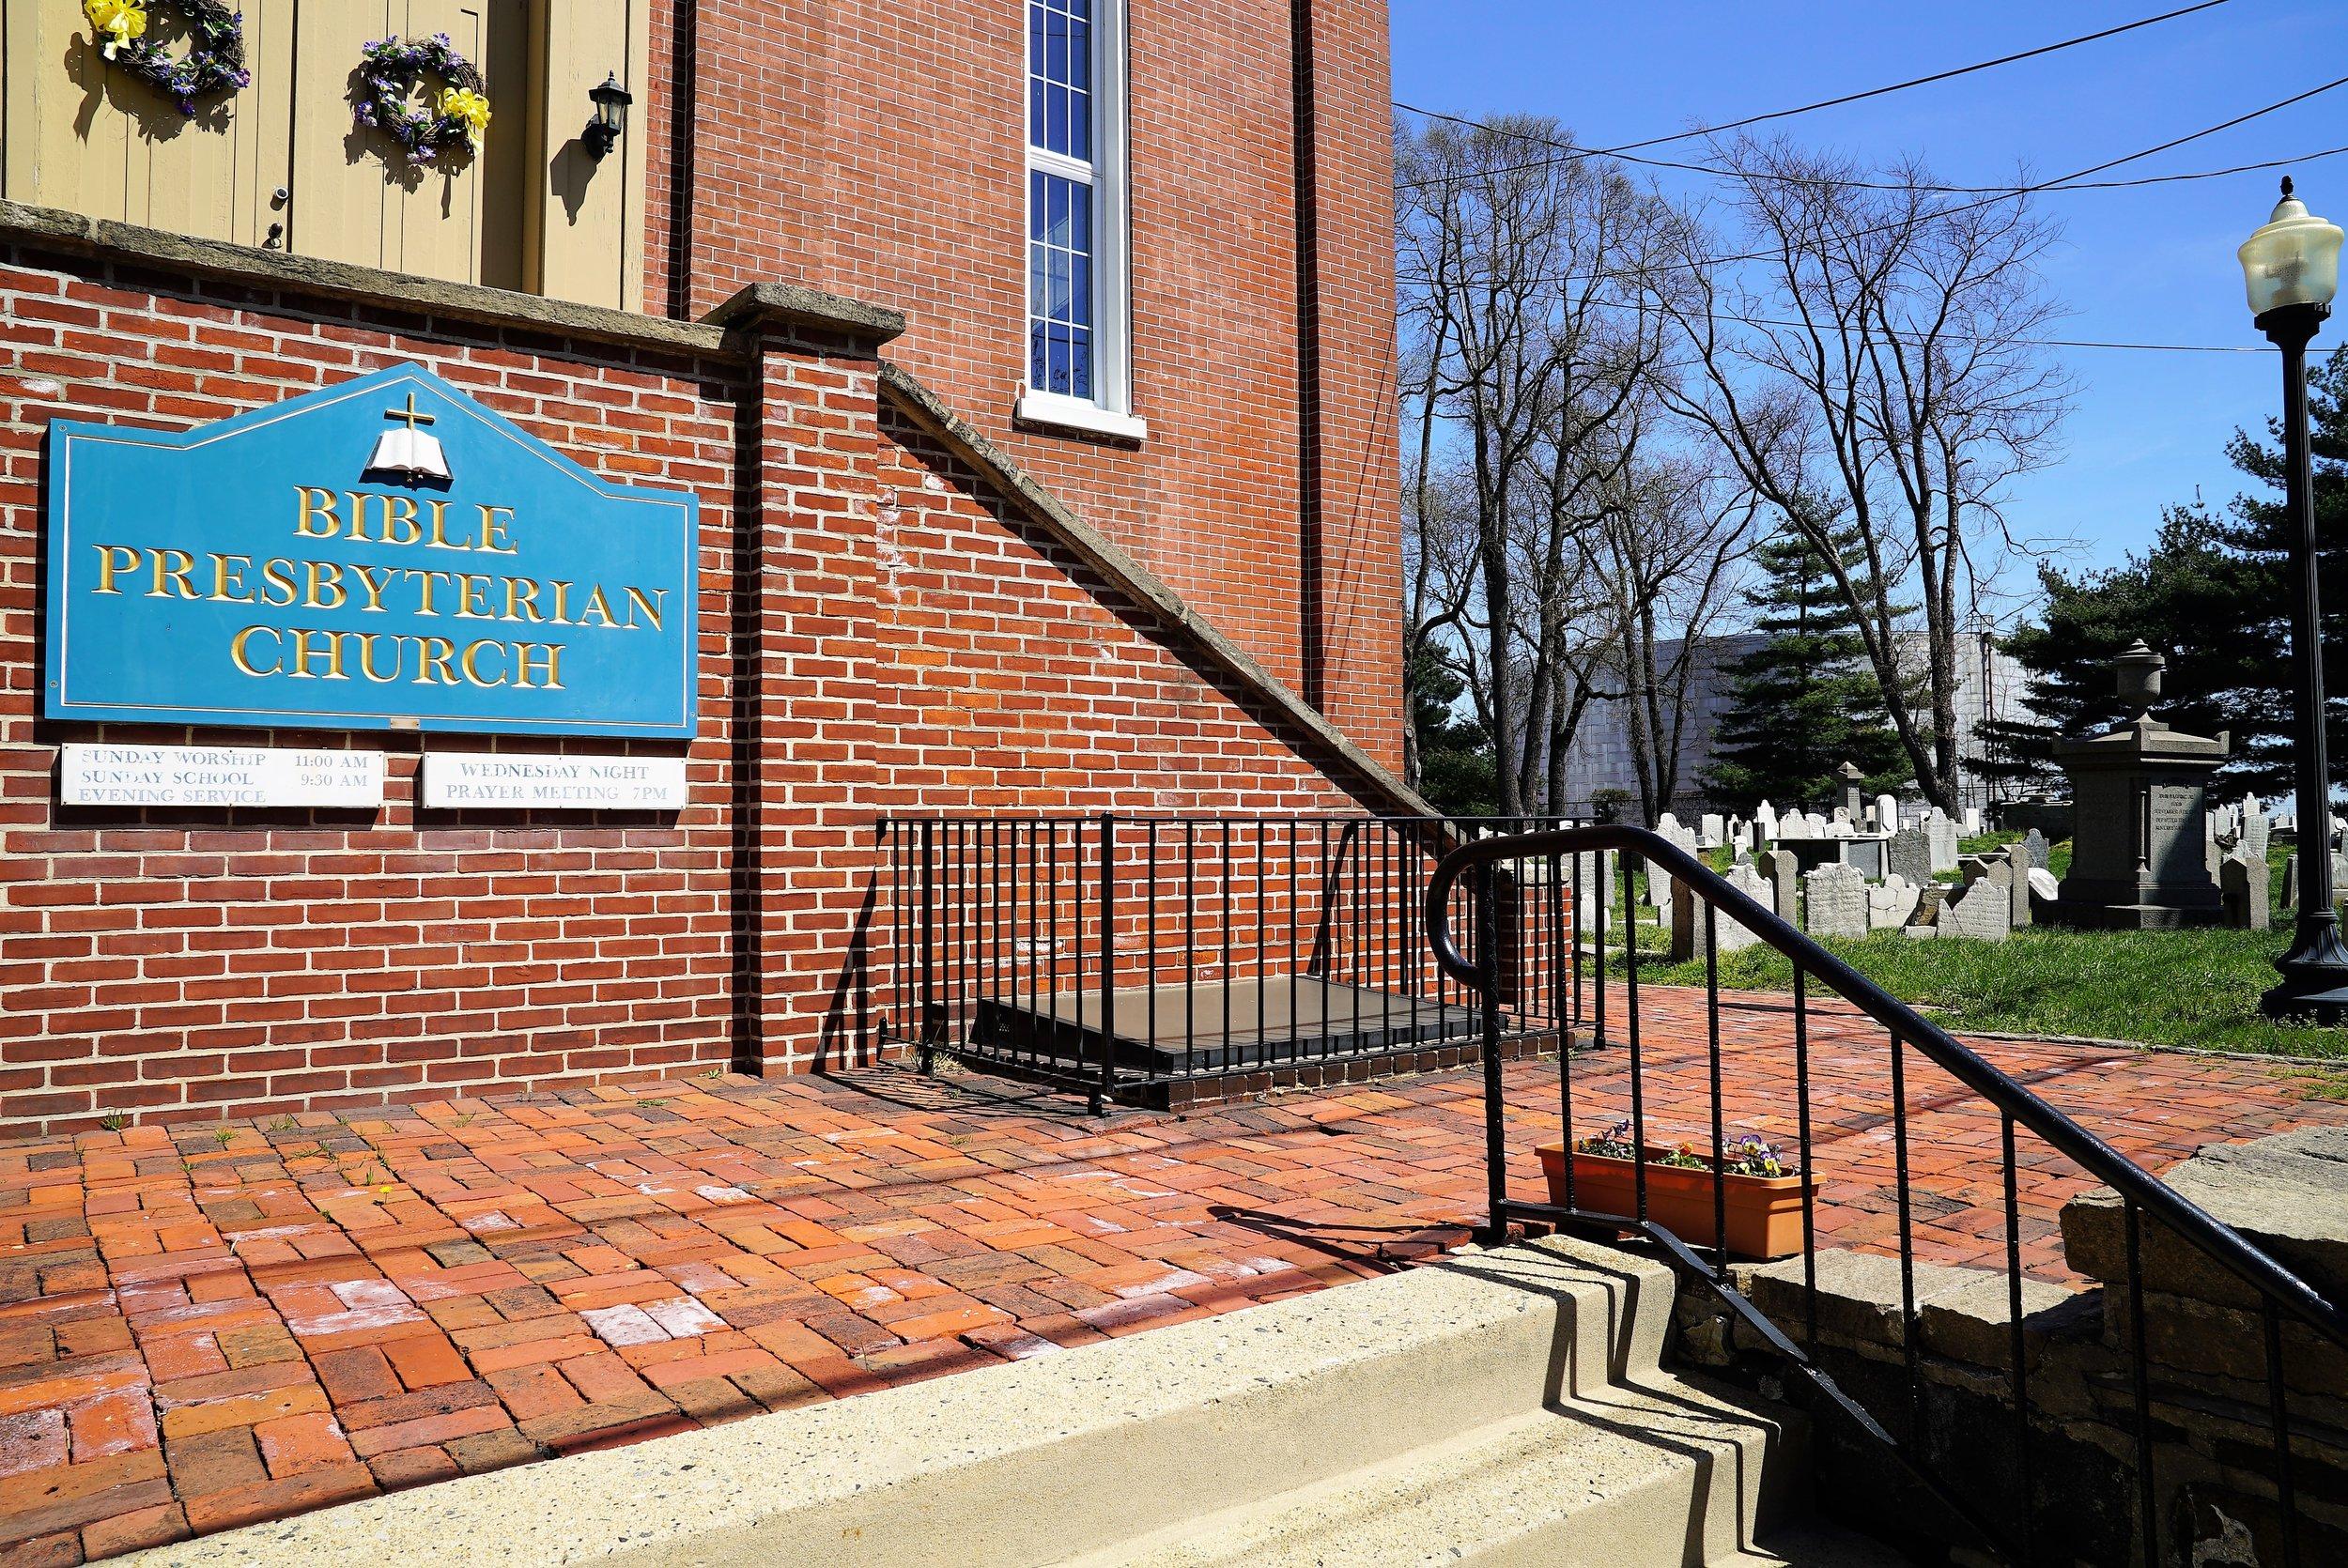 Bible Presbyterian Church Cemetery, Marcus Hook, Pennsylvania.